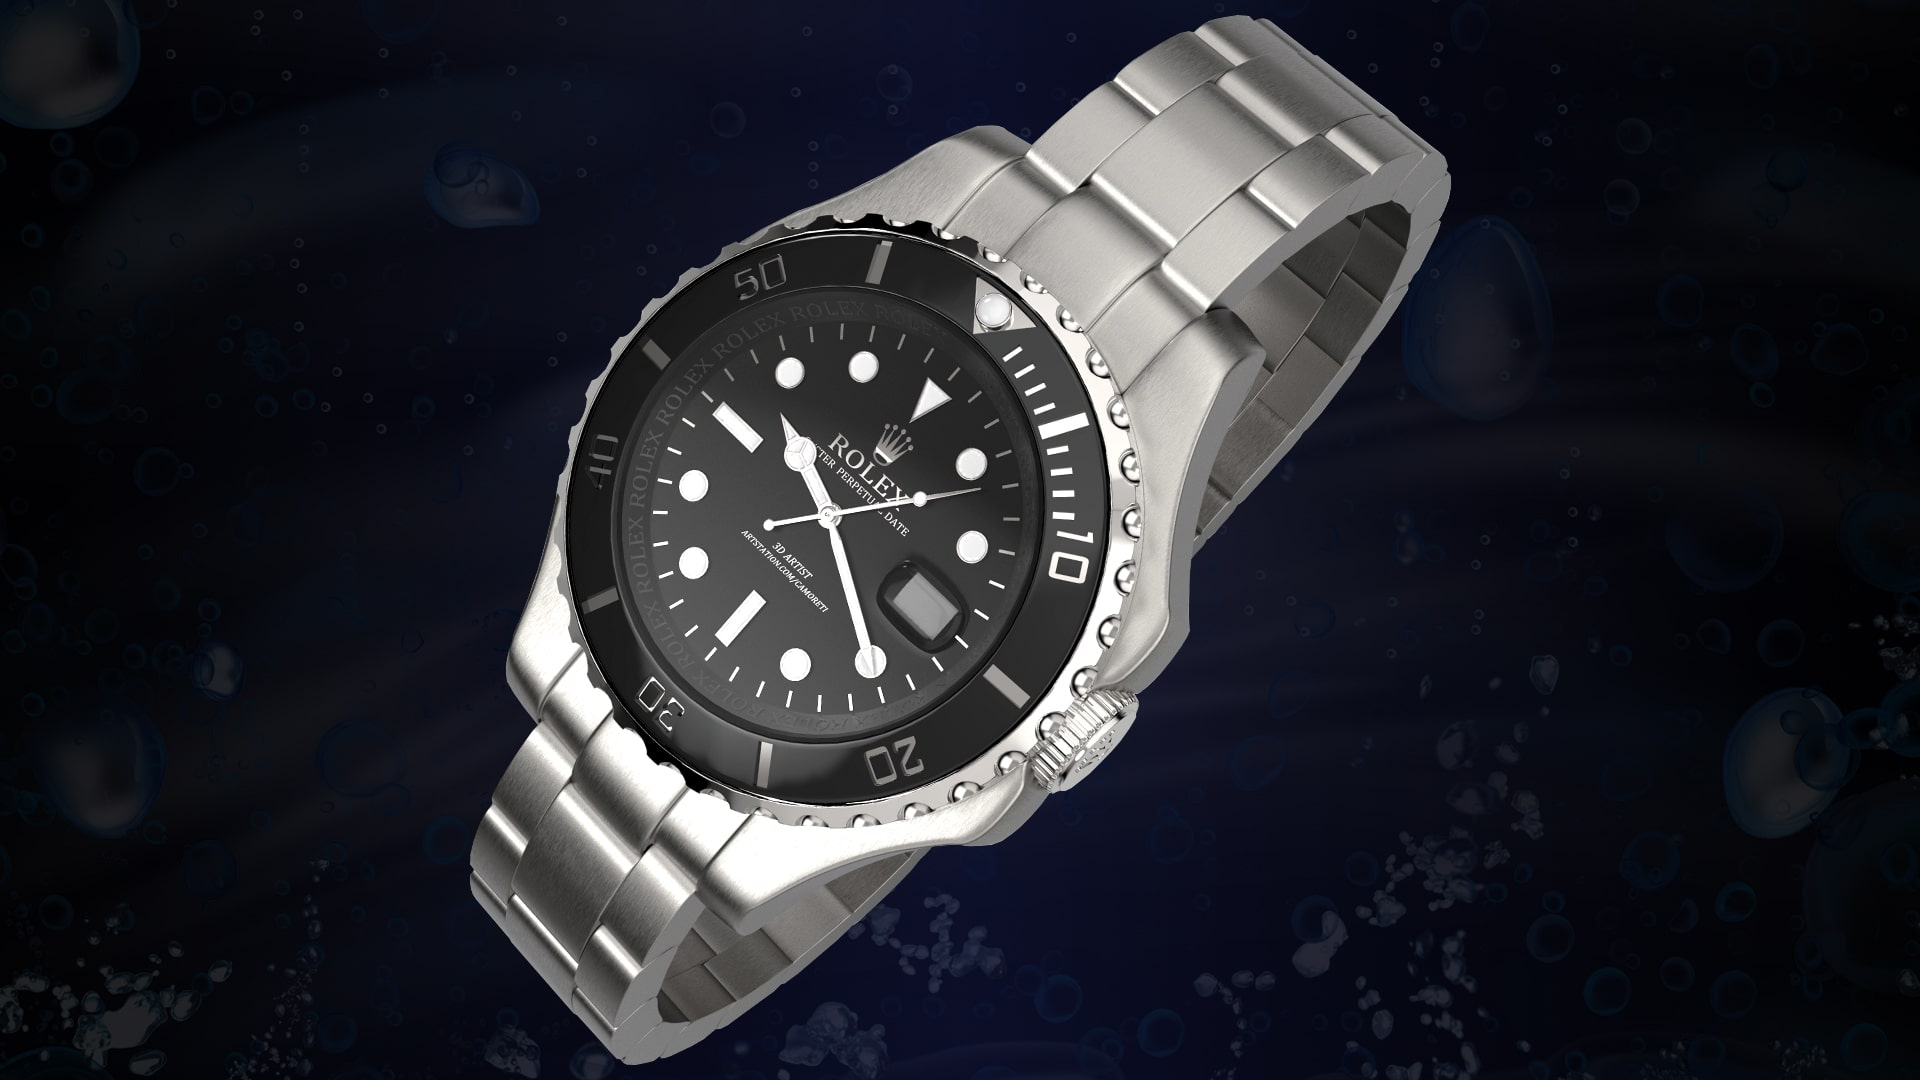 RENDER reloj agencia marketing digital